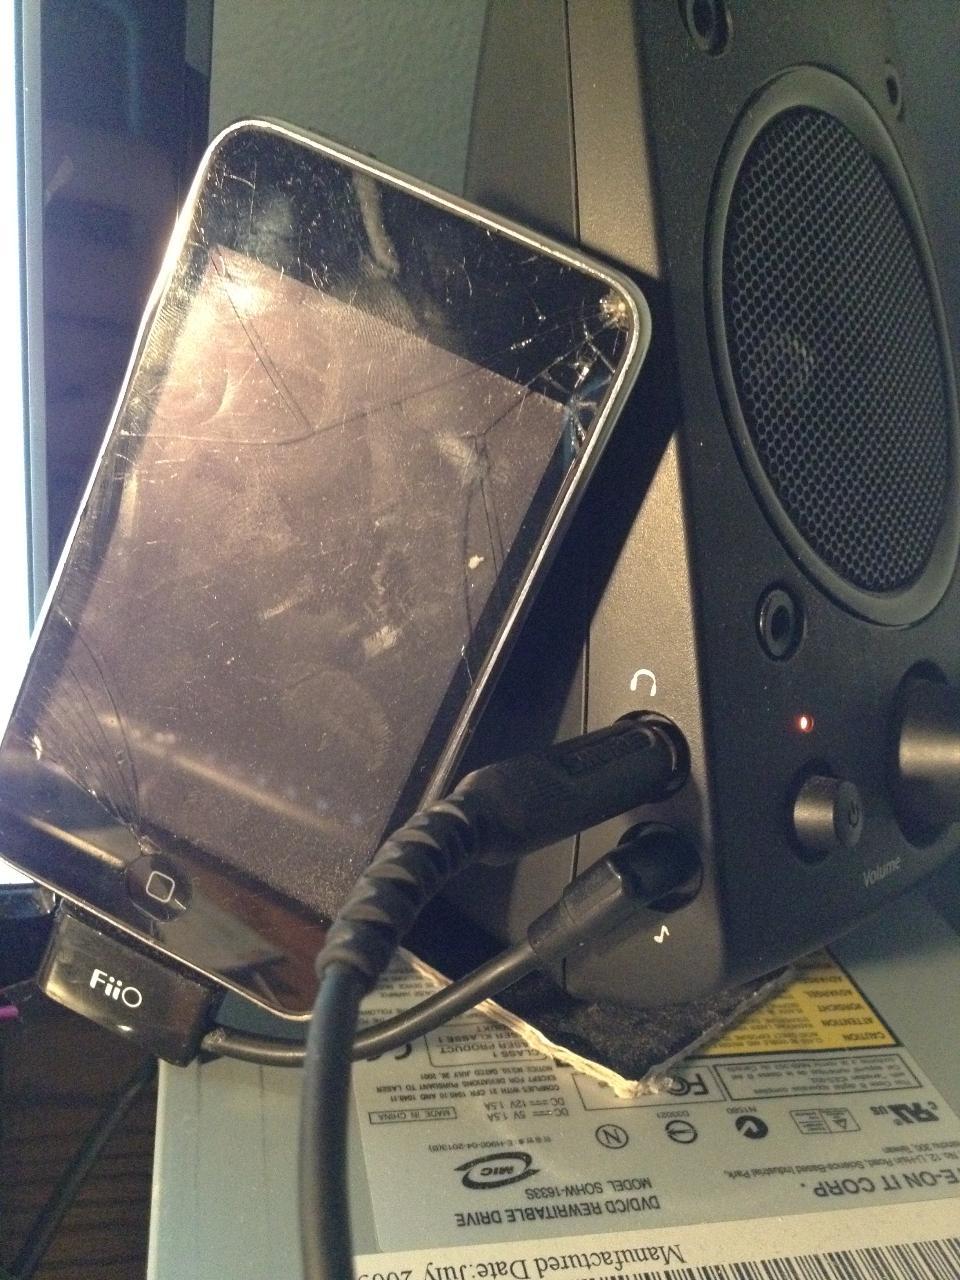 "My E5 broke. temp solution <img src=""https://cdn.head-fi.org/e/headfi/smily_headphones1.gif""..."